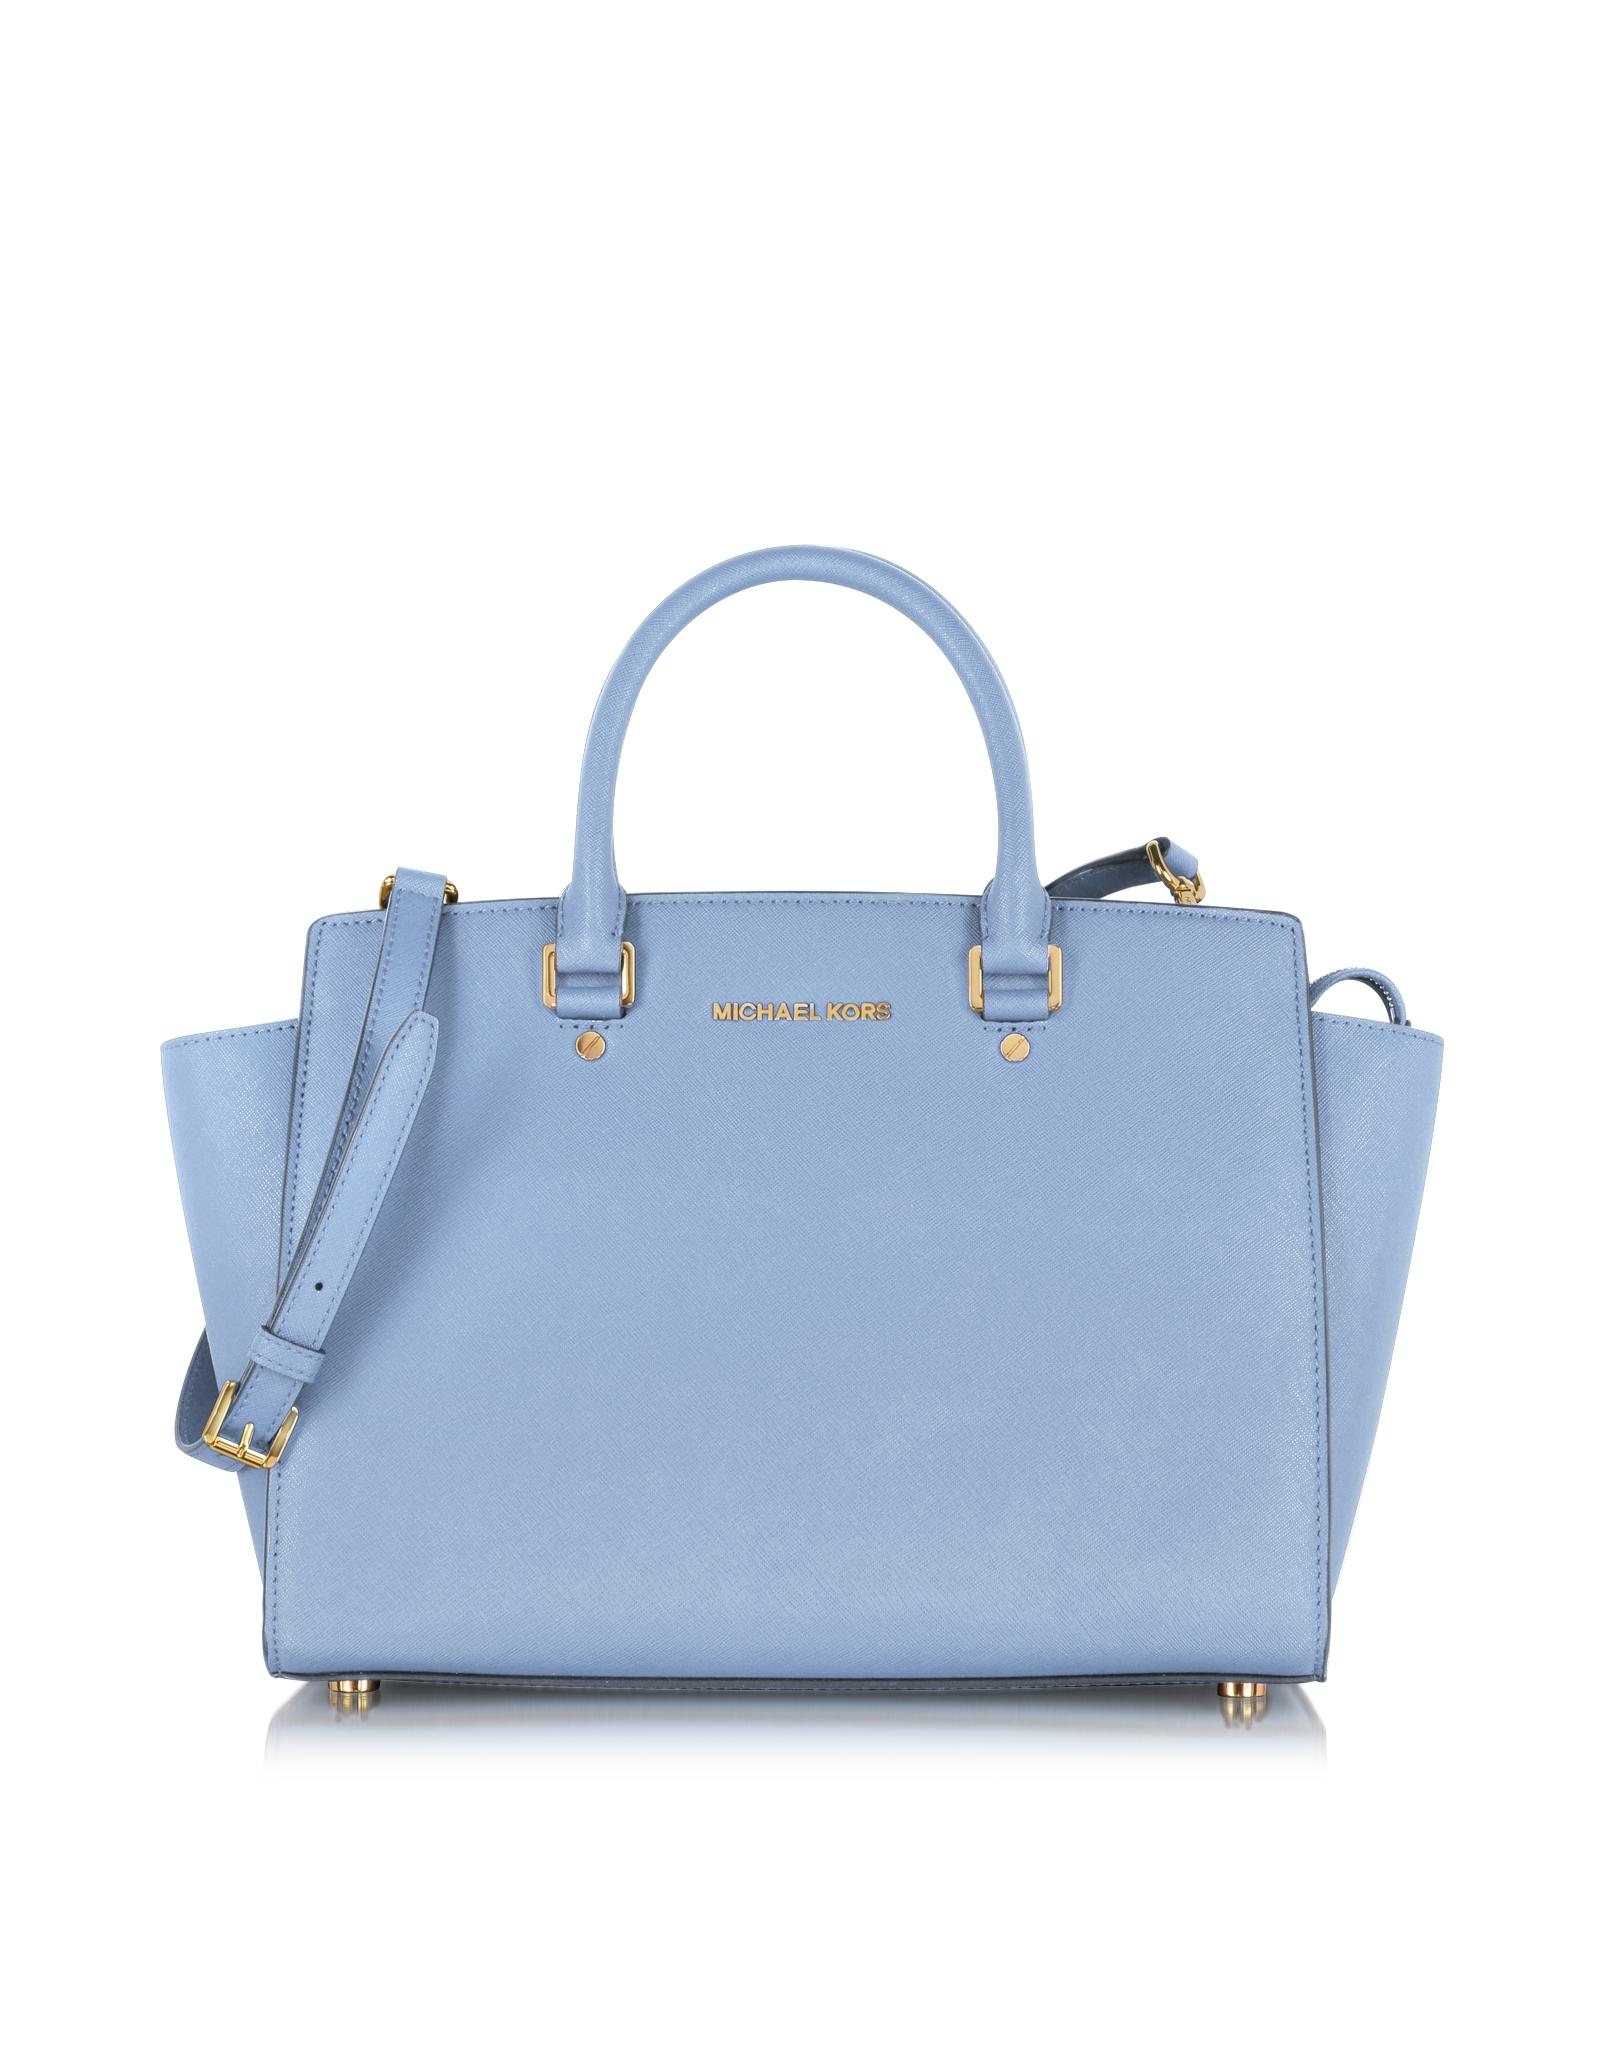 467492ee3807 Michael Kors Large Selma Top-zip Saffiano Leather Satchel in Blue - Lyst